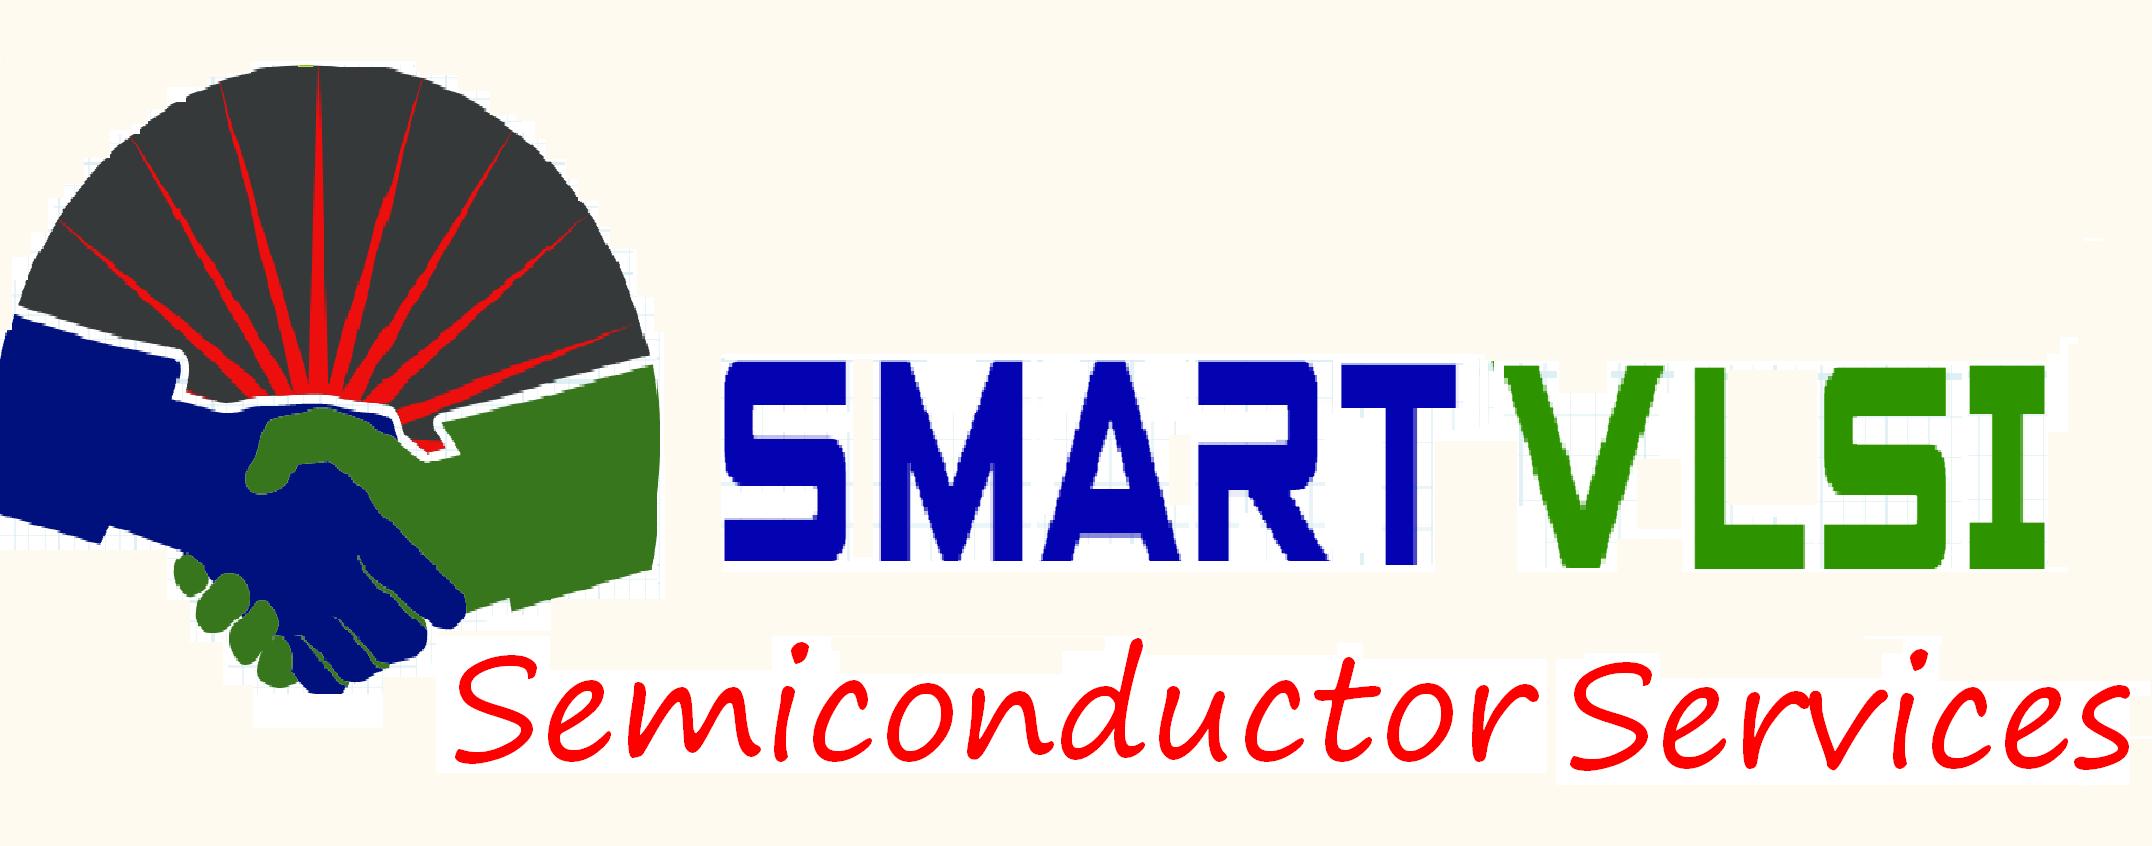 Smart VLSI - Product Management company logo